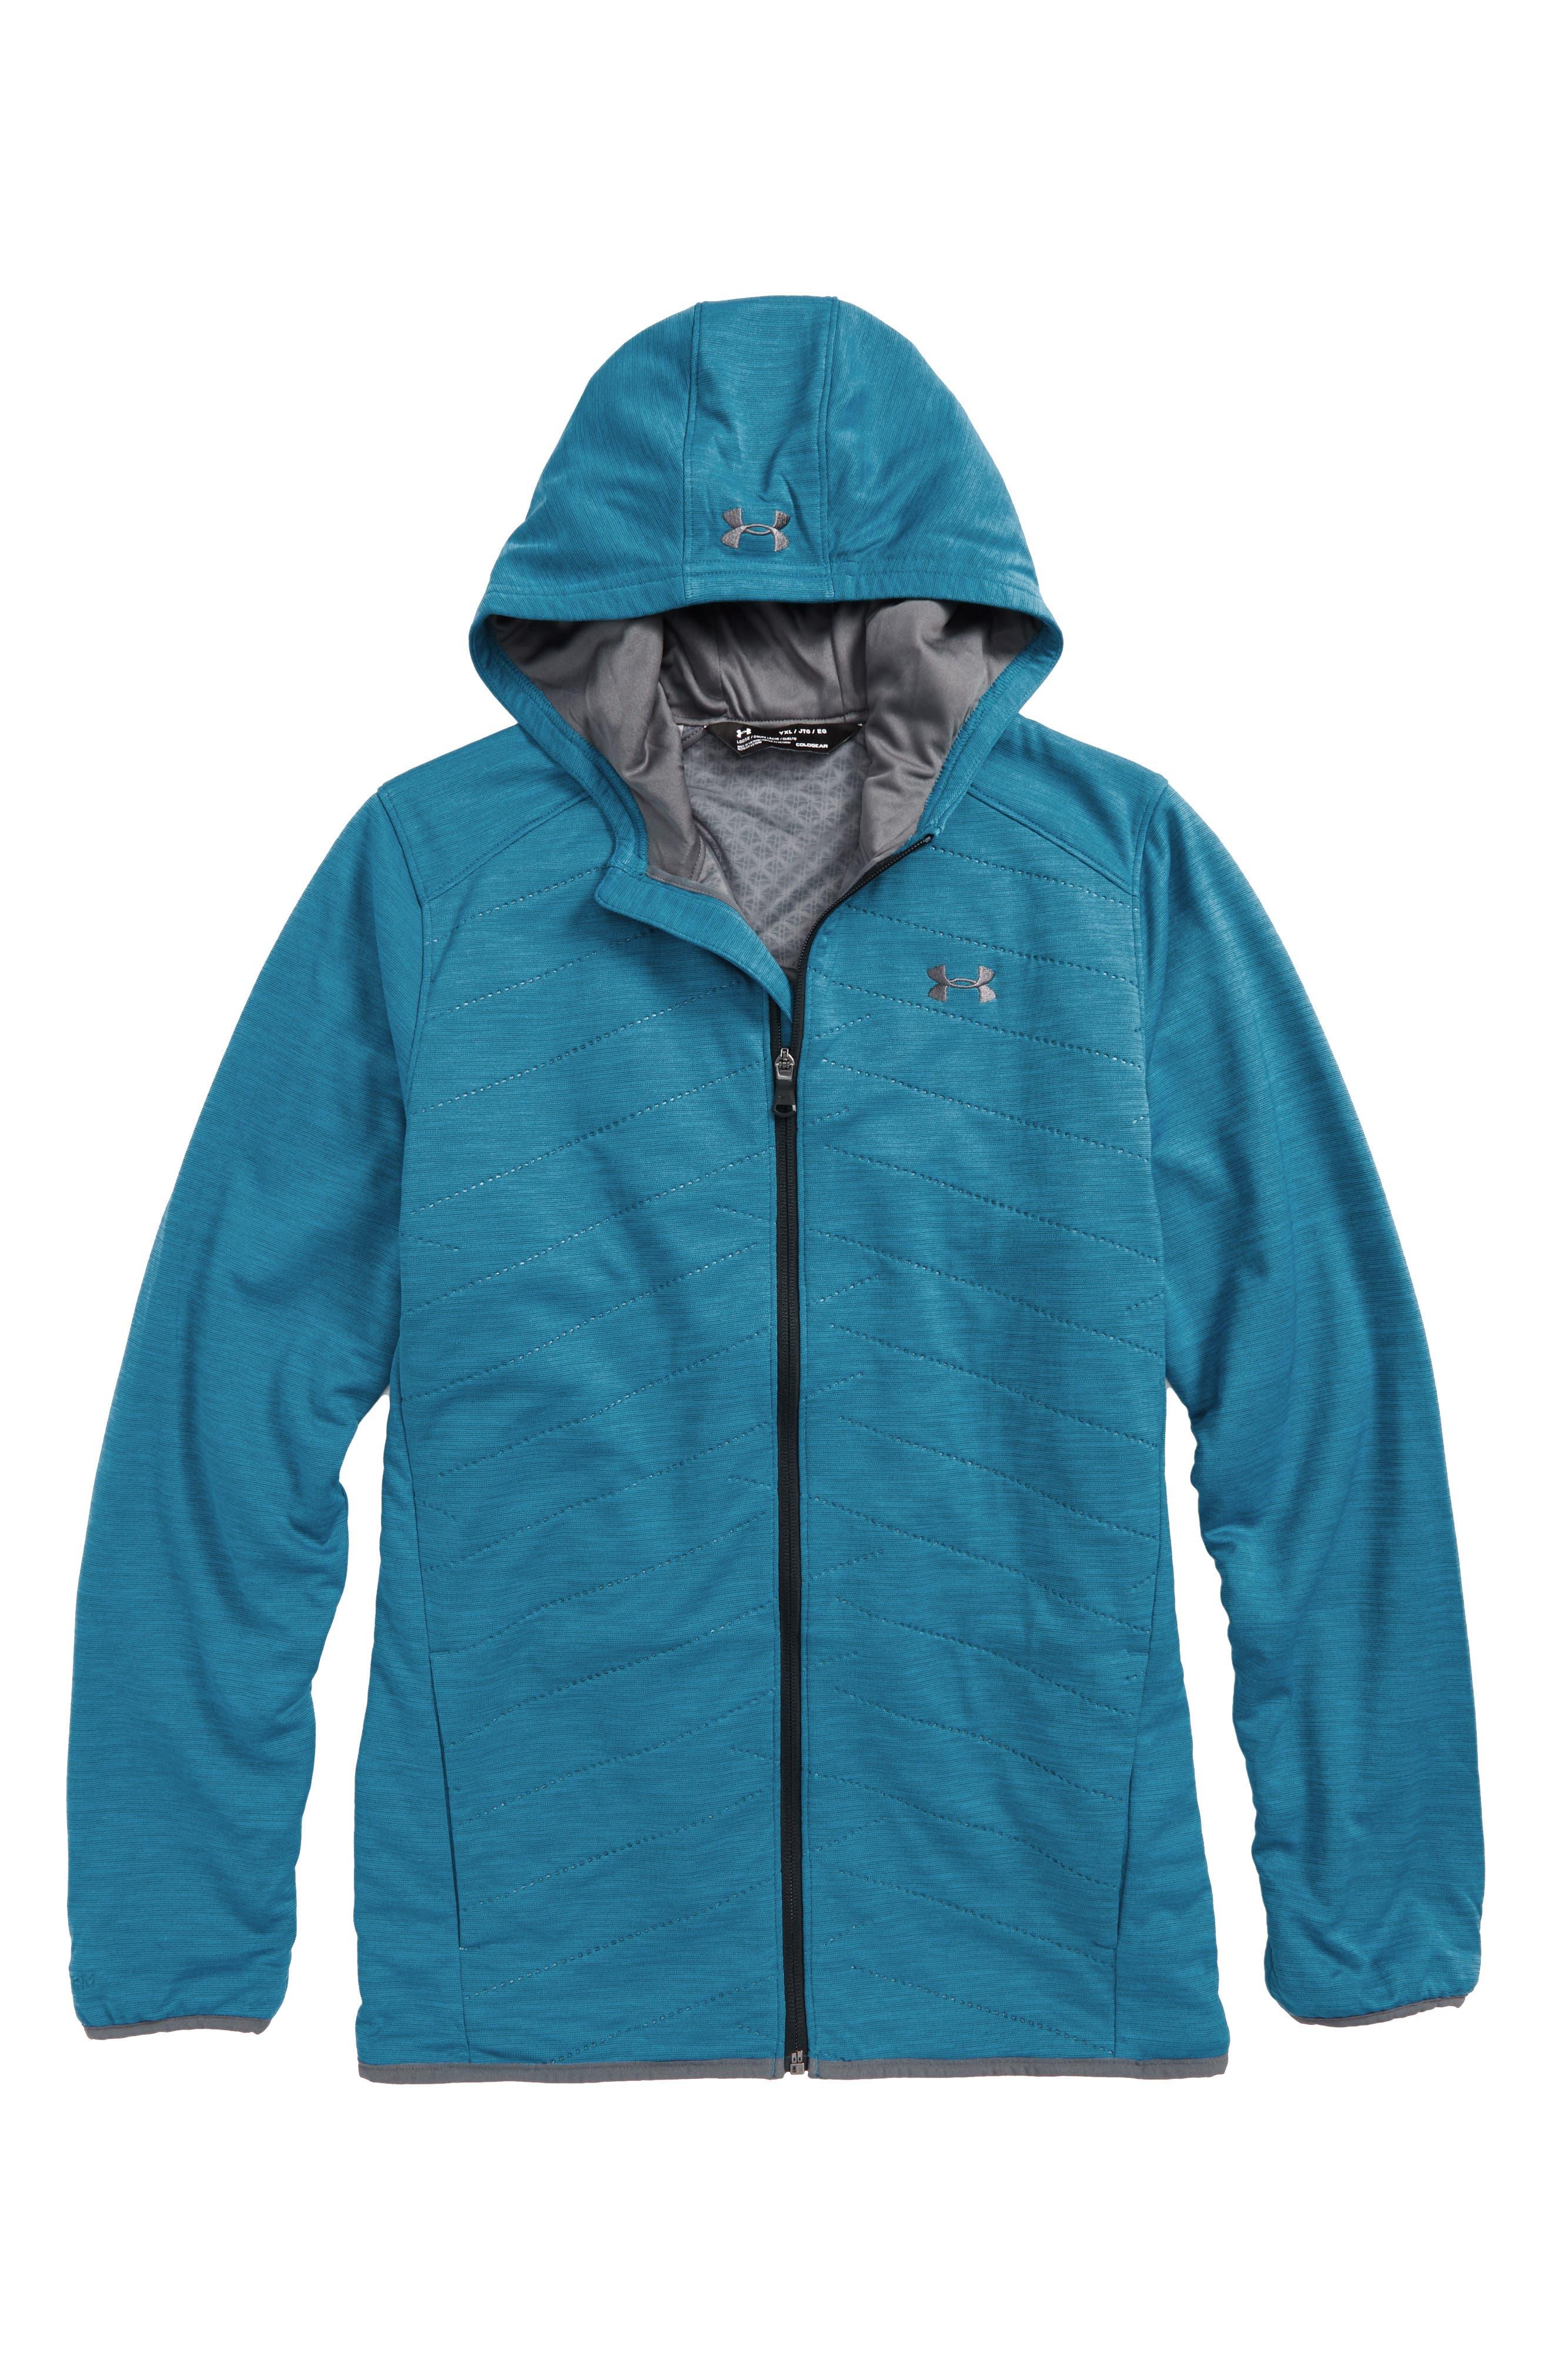 Main Image - Under Armour ColdGear® Reactor Hybrid Hooded Jacket (Big Boys)